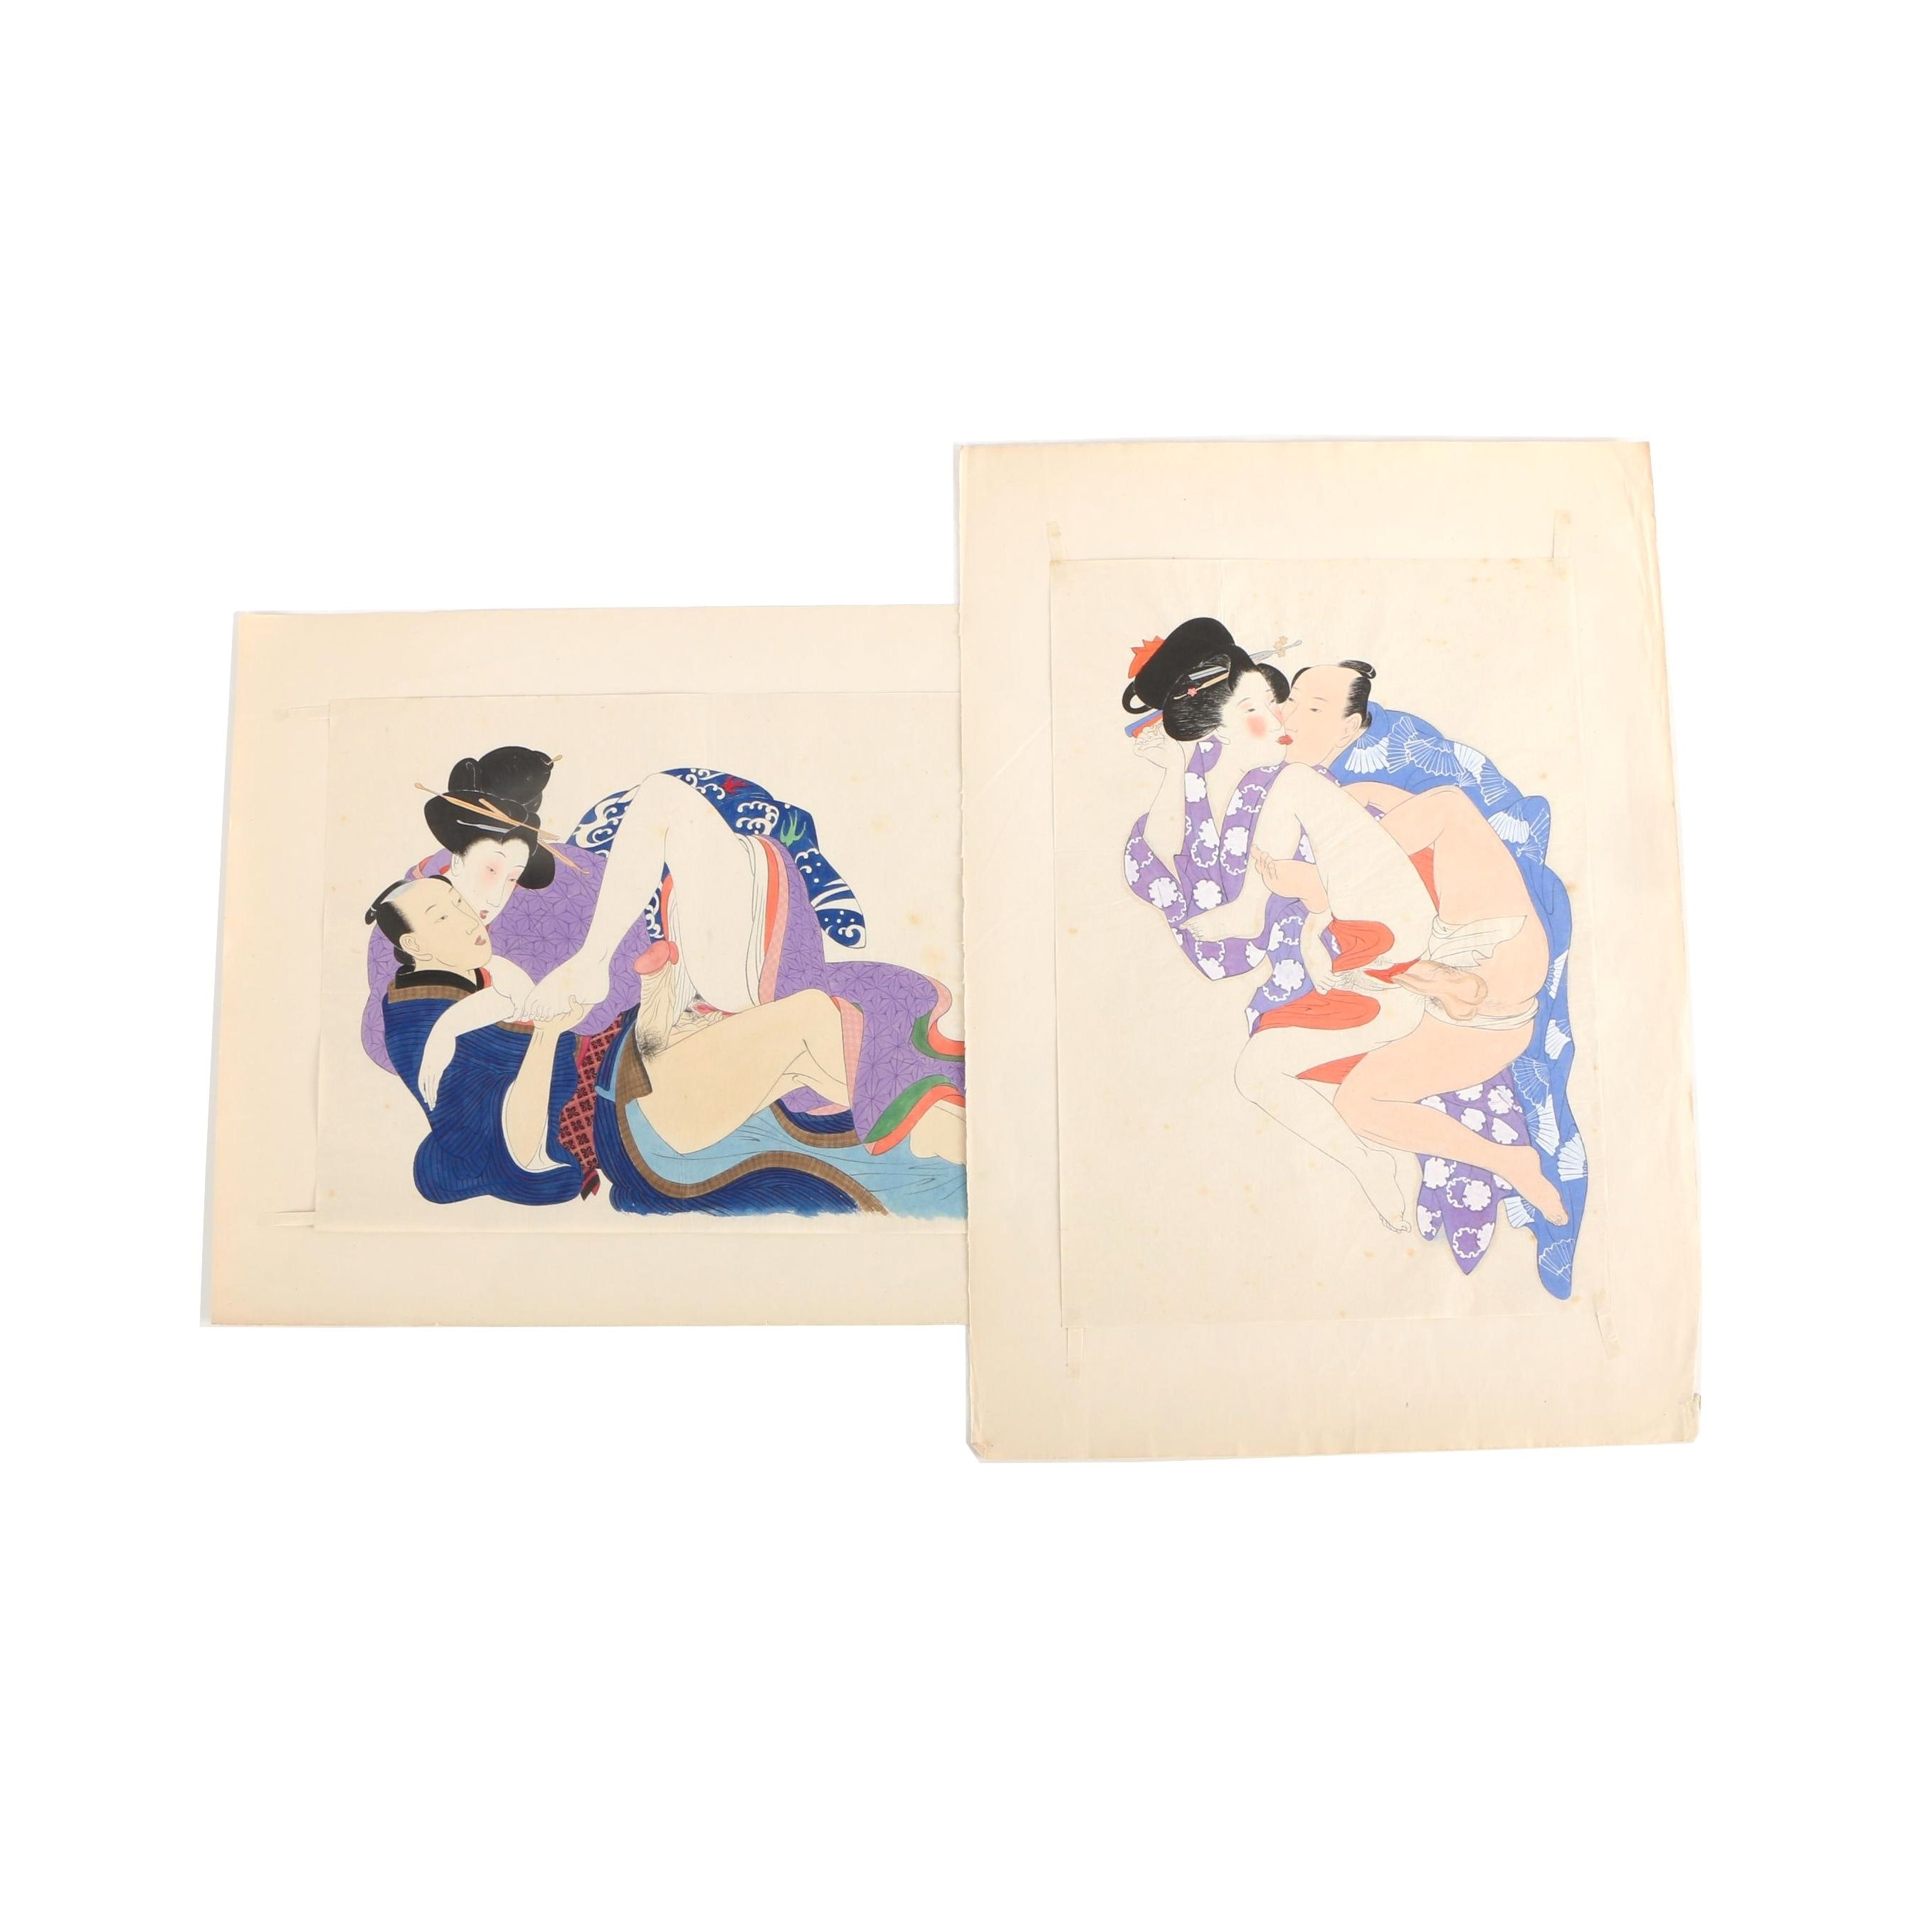 Shunga Style Ink and Gouache Paintings After Kitagawa Utamaro